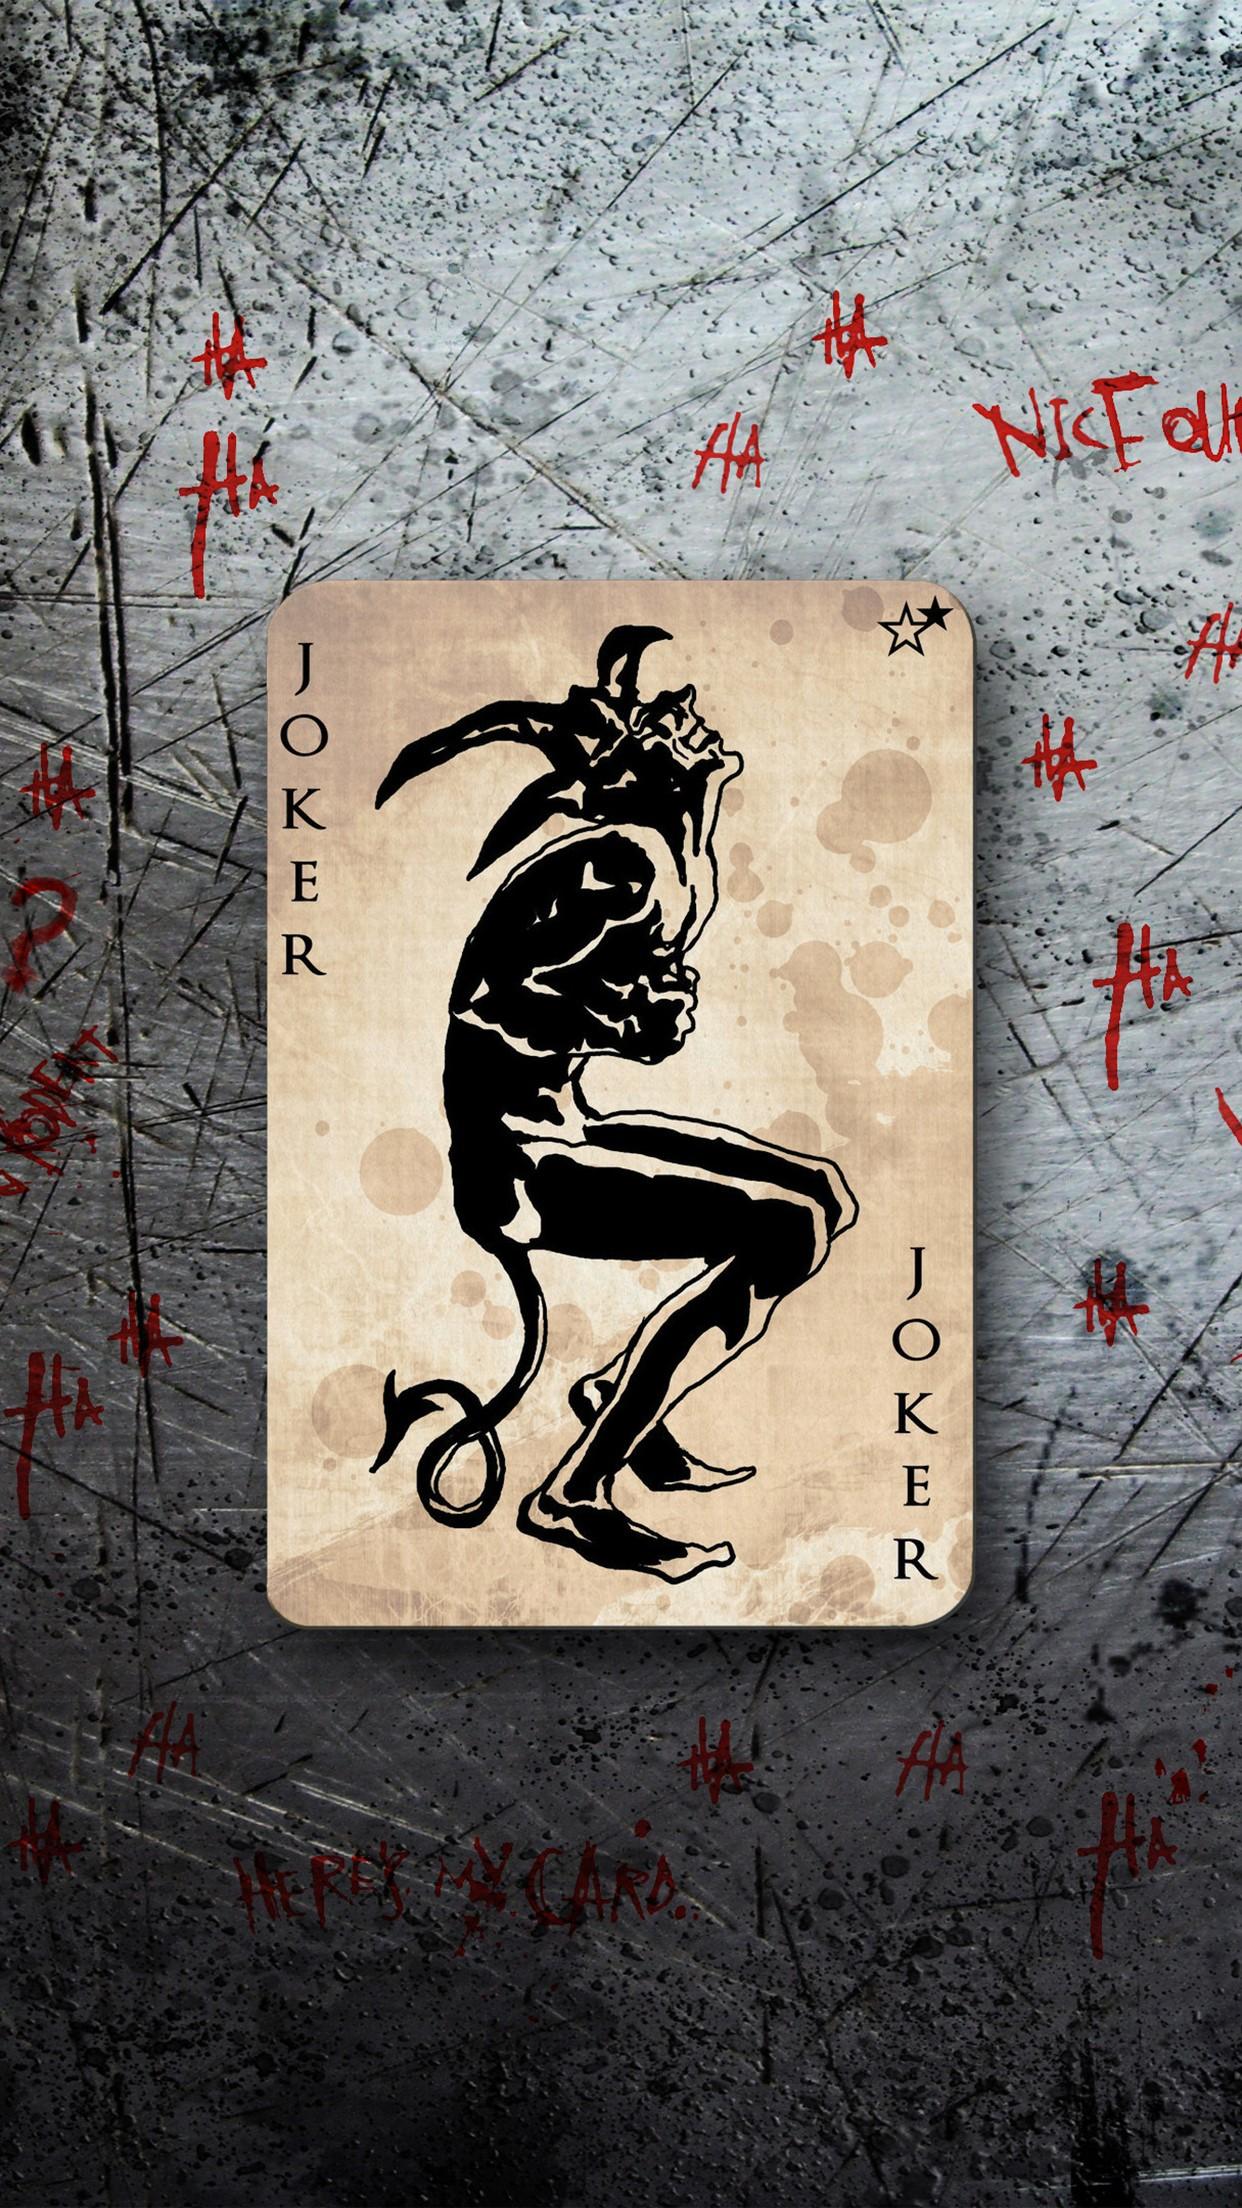 Joker 2k wallpapers